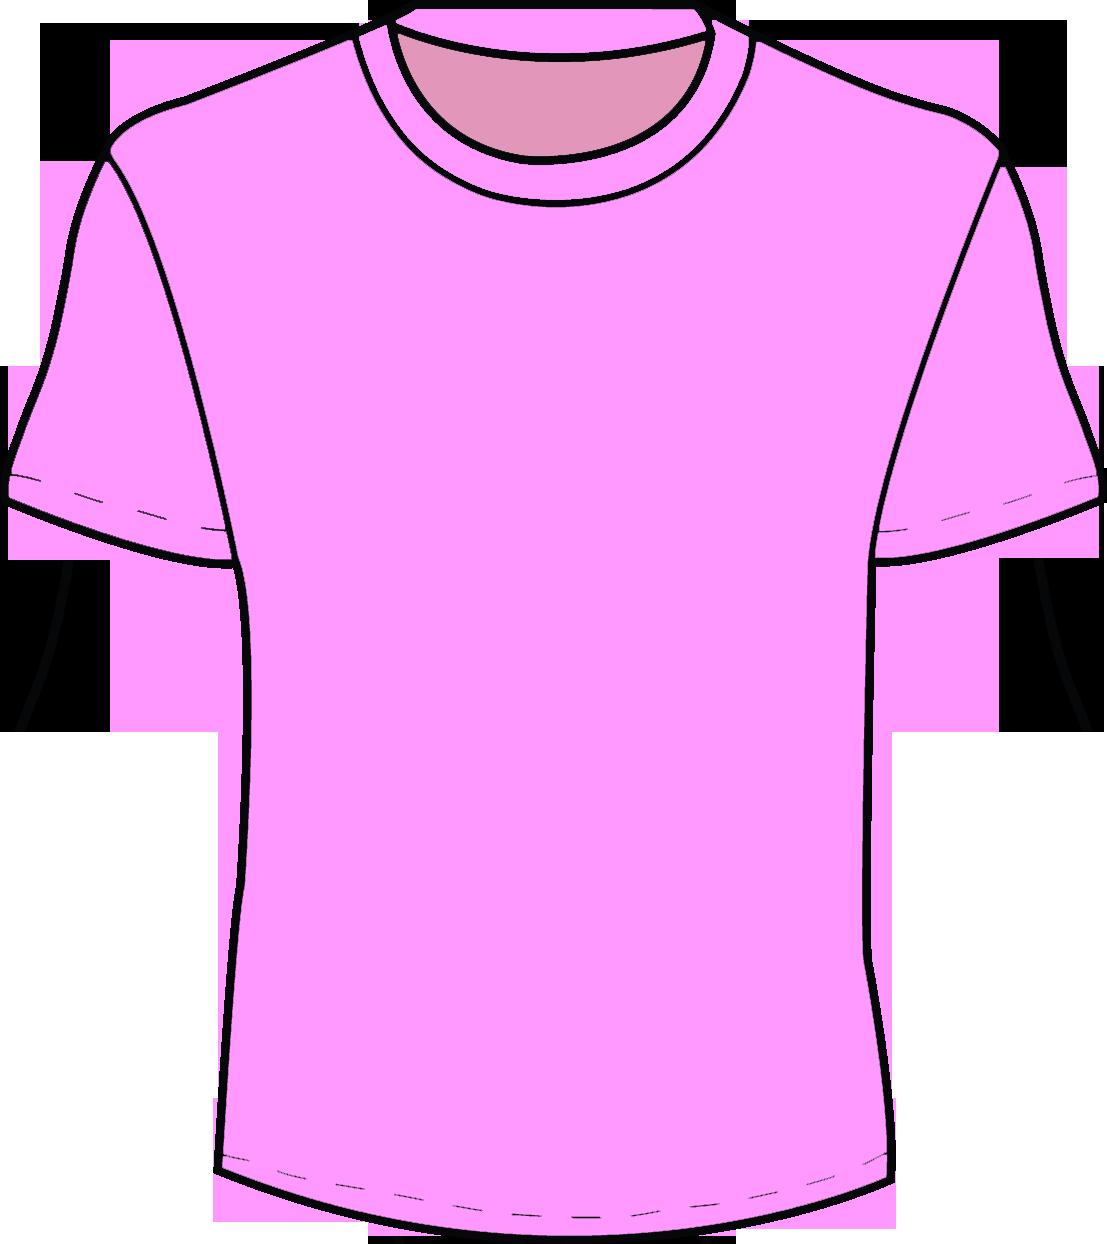 Clipart shirt kid shirt. The long walk t